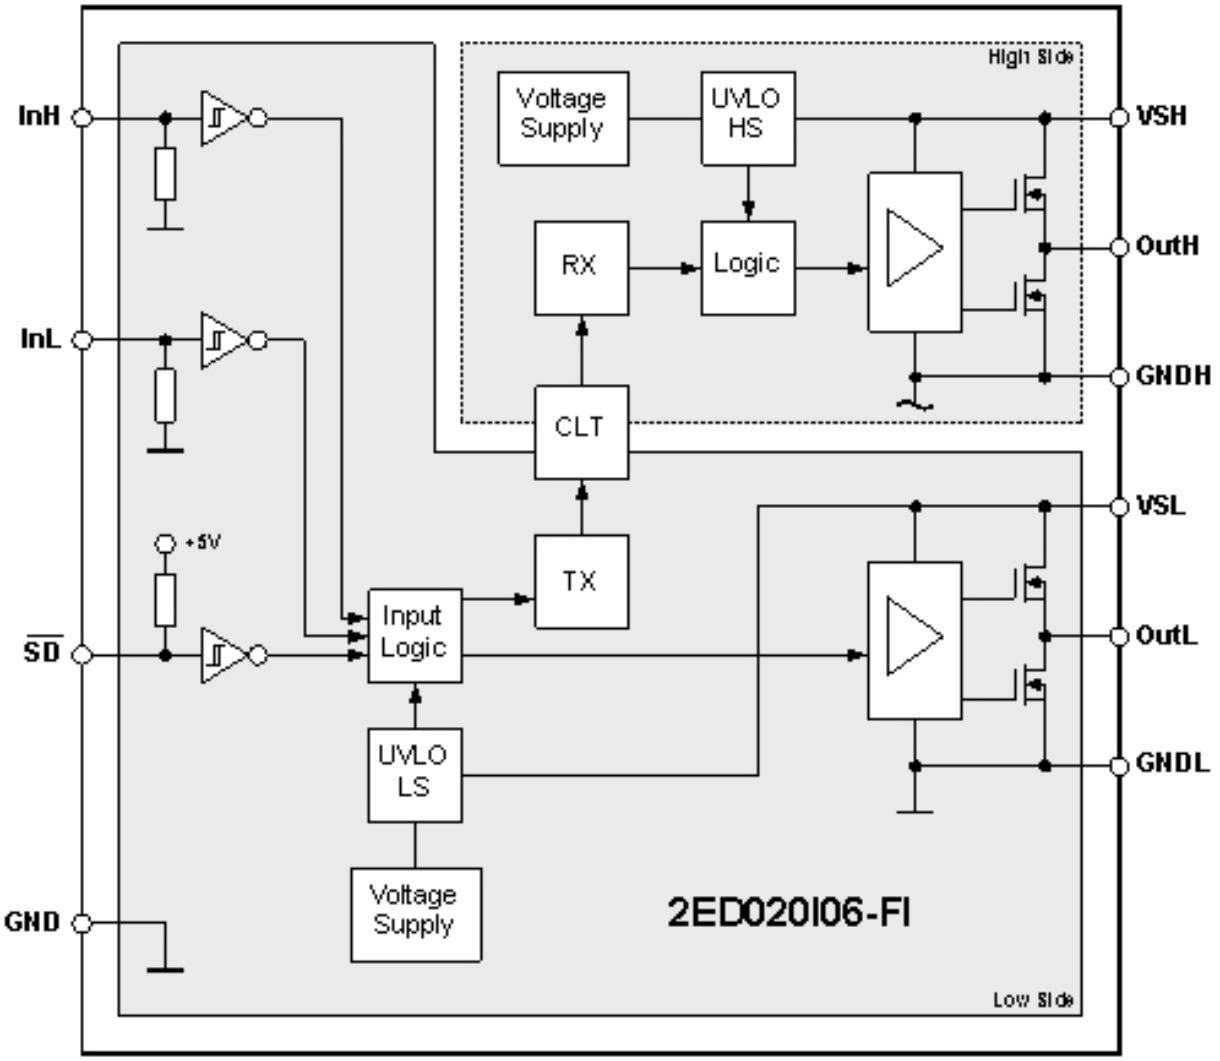 2ed020i06 Fi Infineon Technologies Logic Combi 30 Diagram Diagrams Prevnext